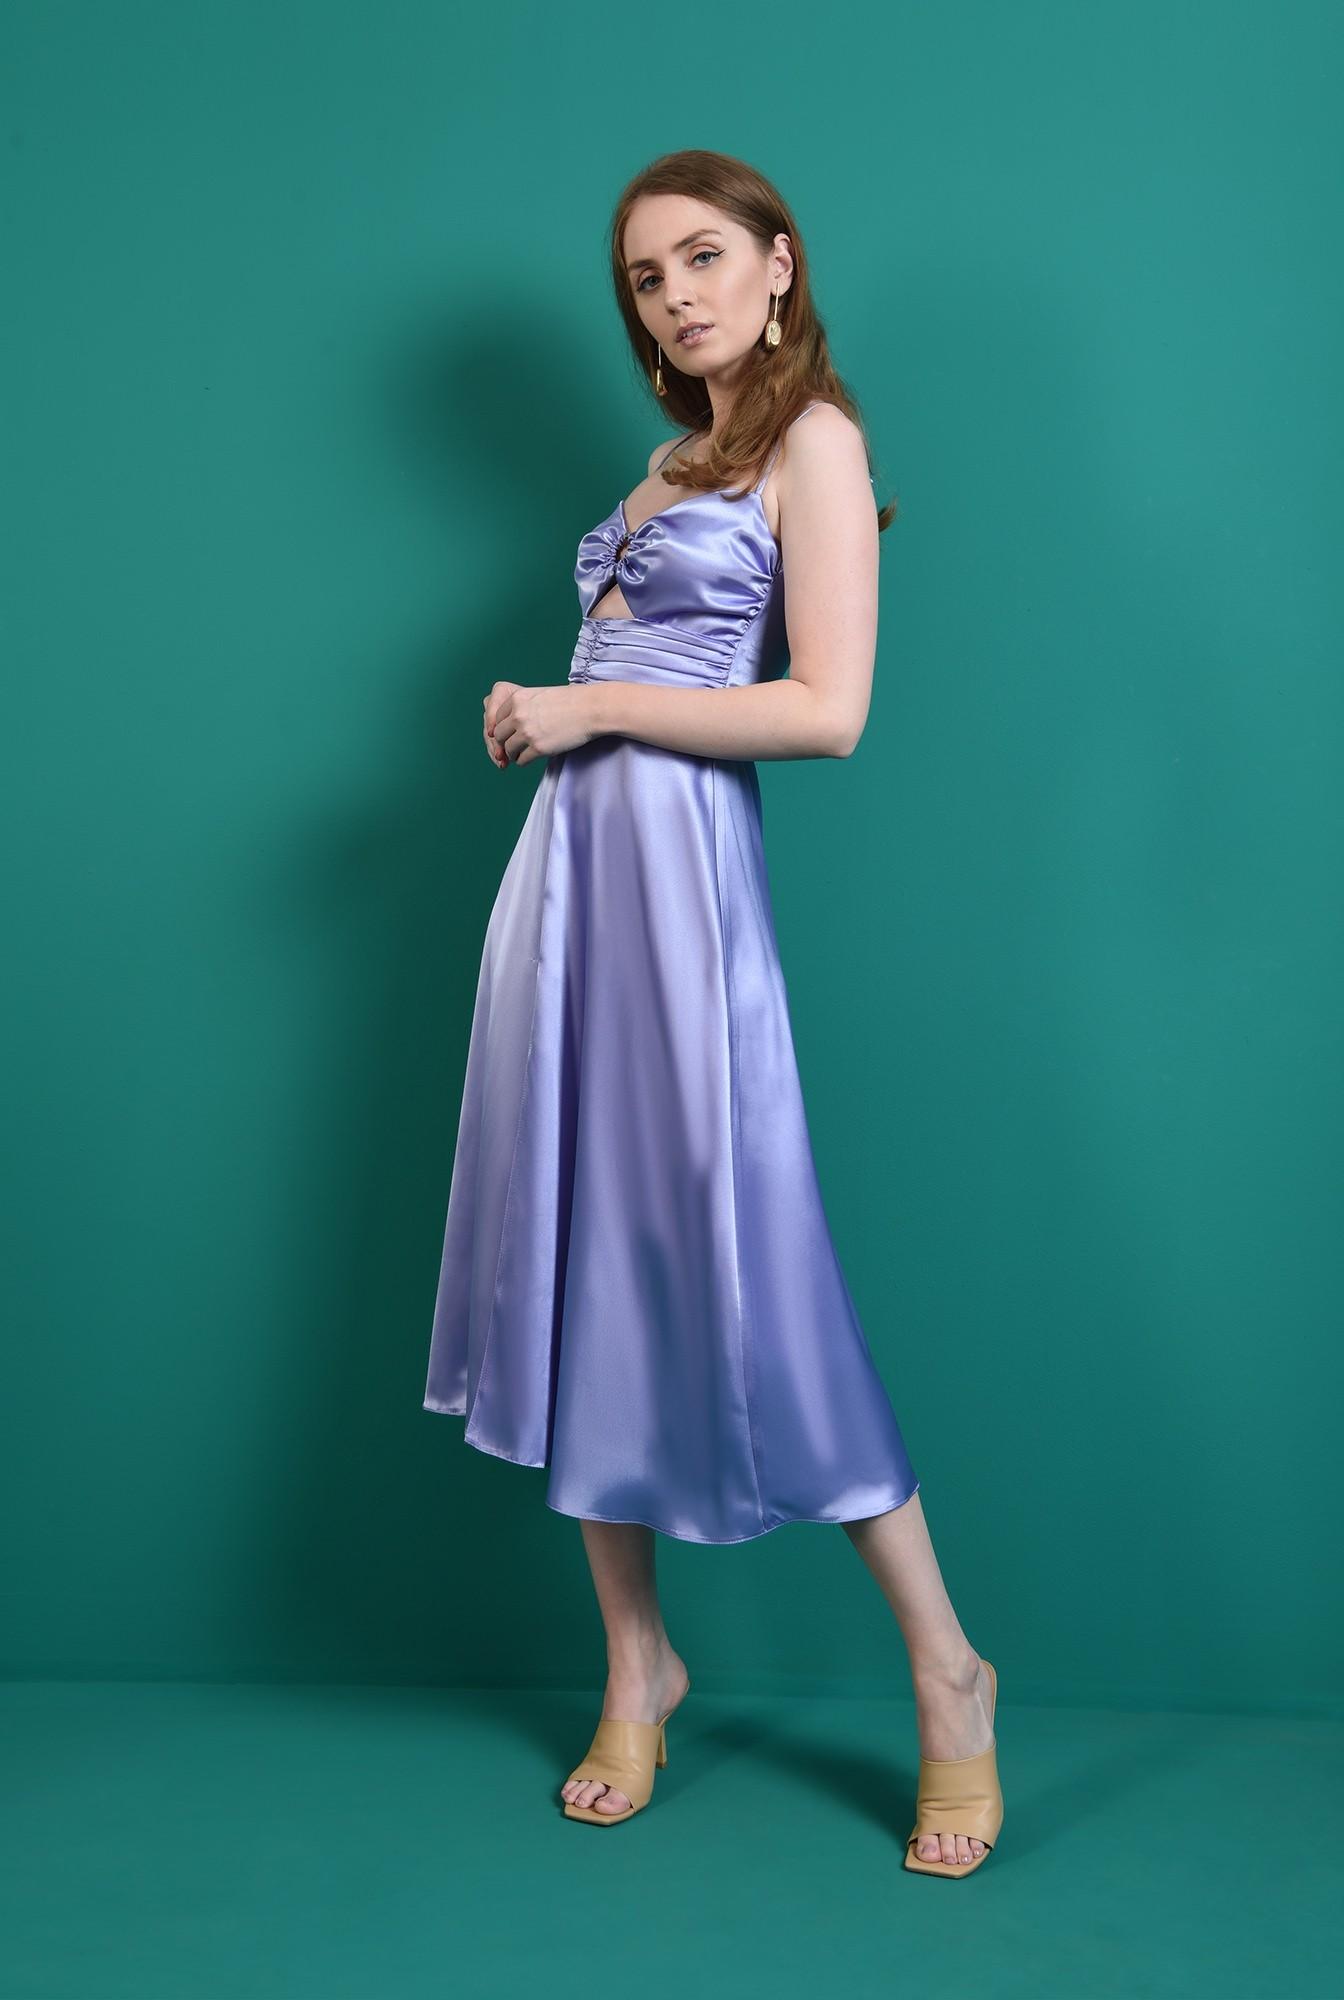 0 - rochie eleganta, lila, fronsata, Poema